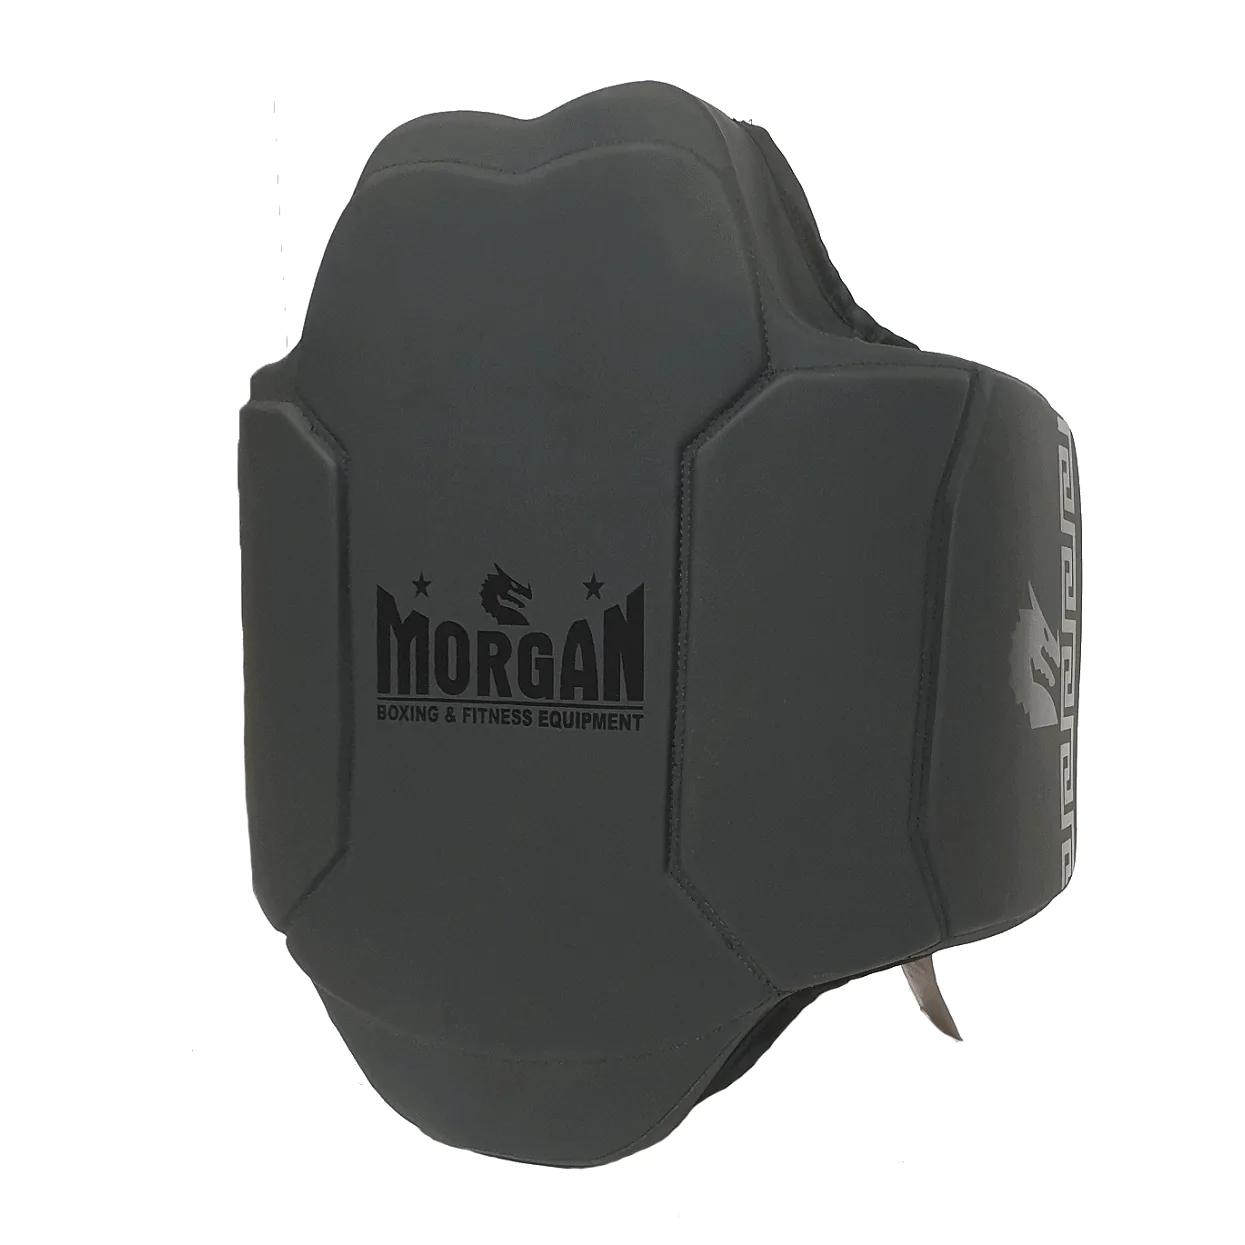 Morgan Platinum Body Protector